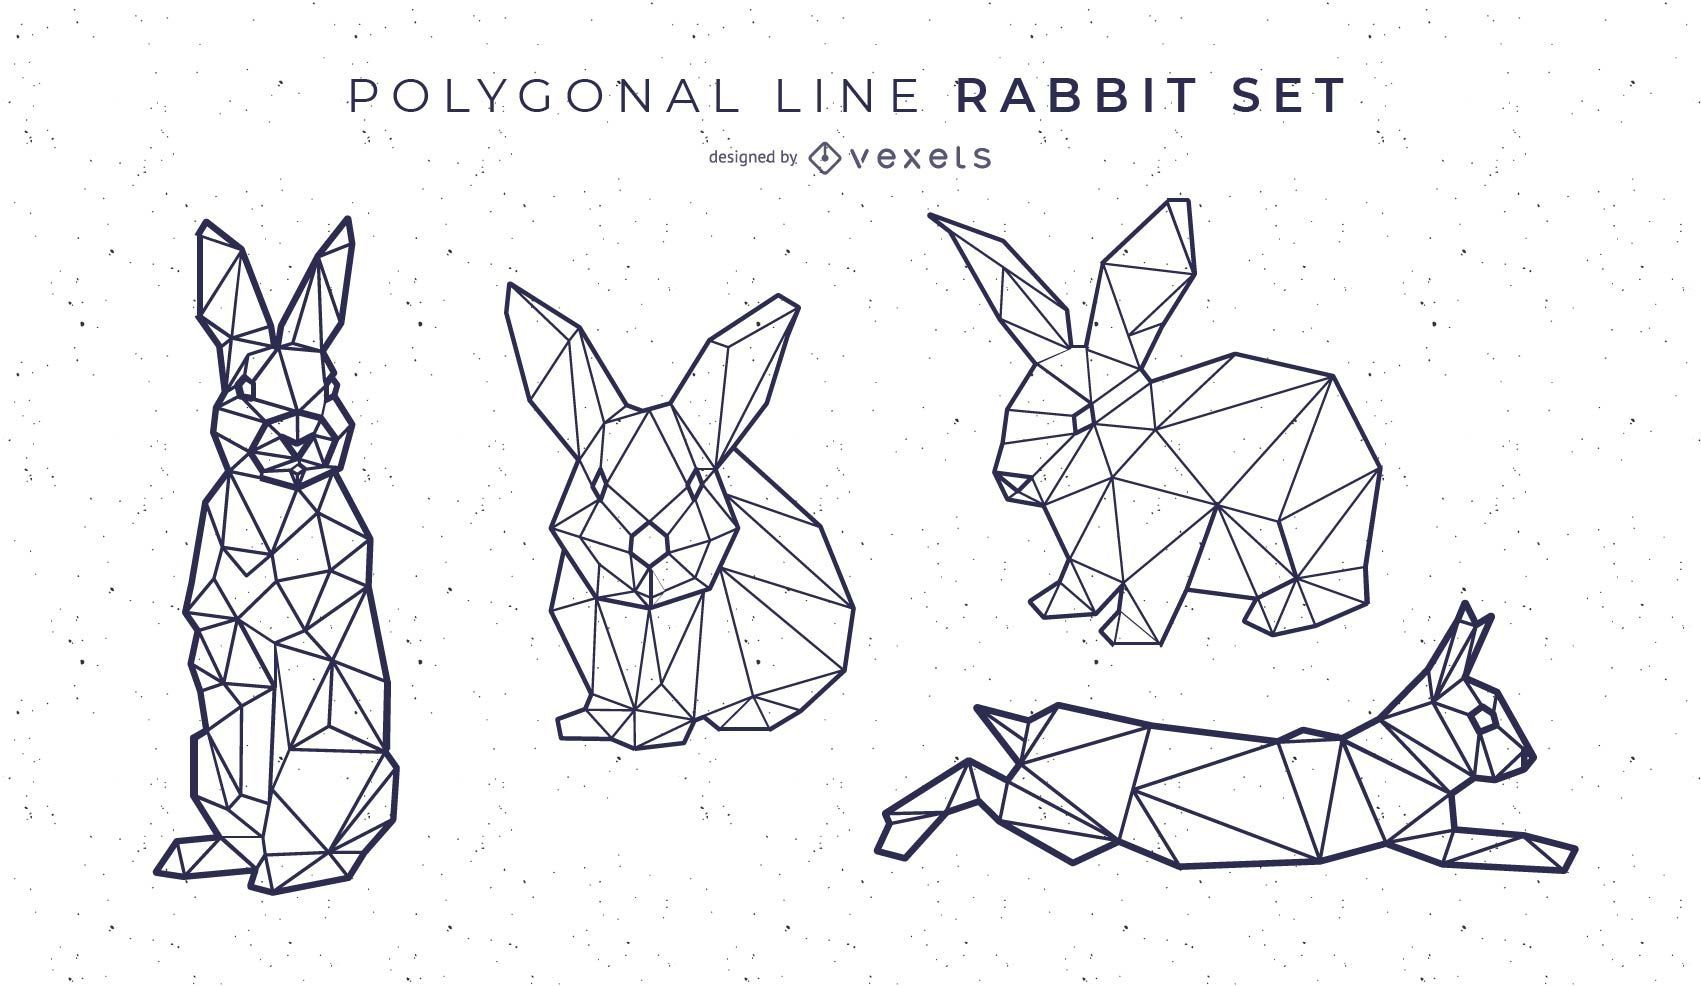 Polygonal Line Rabbit Set